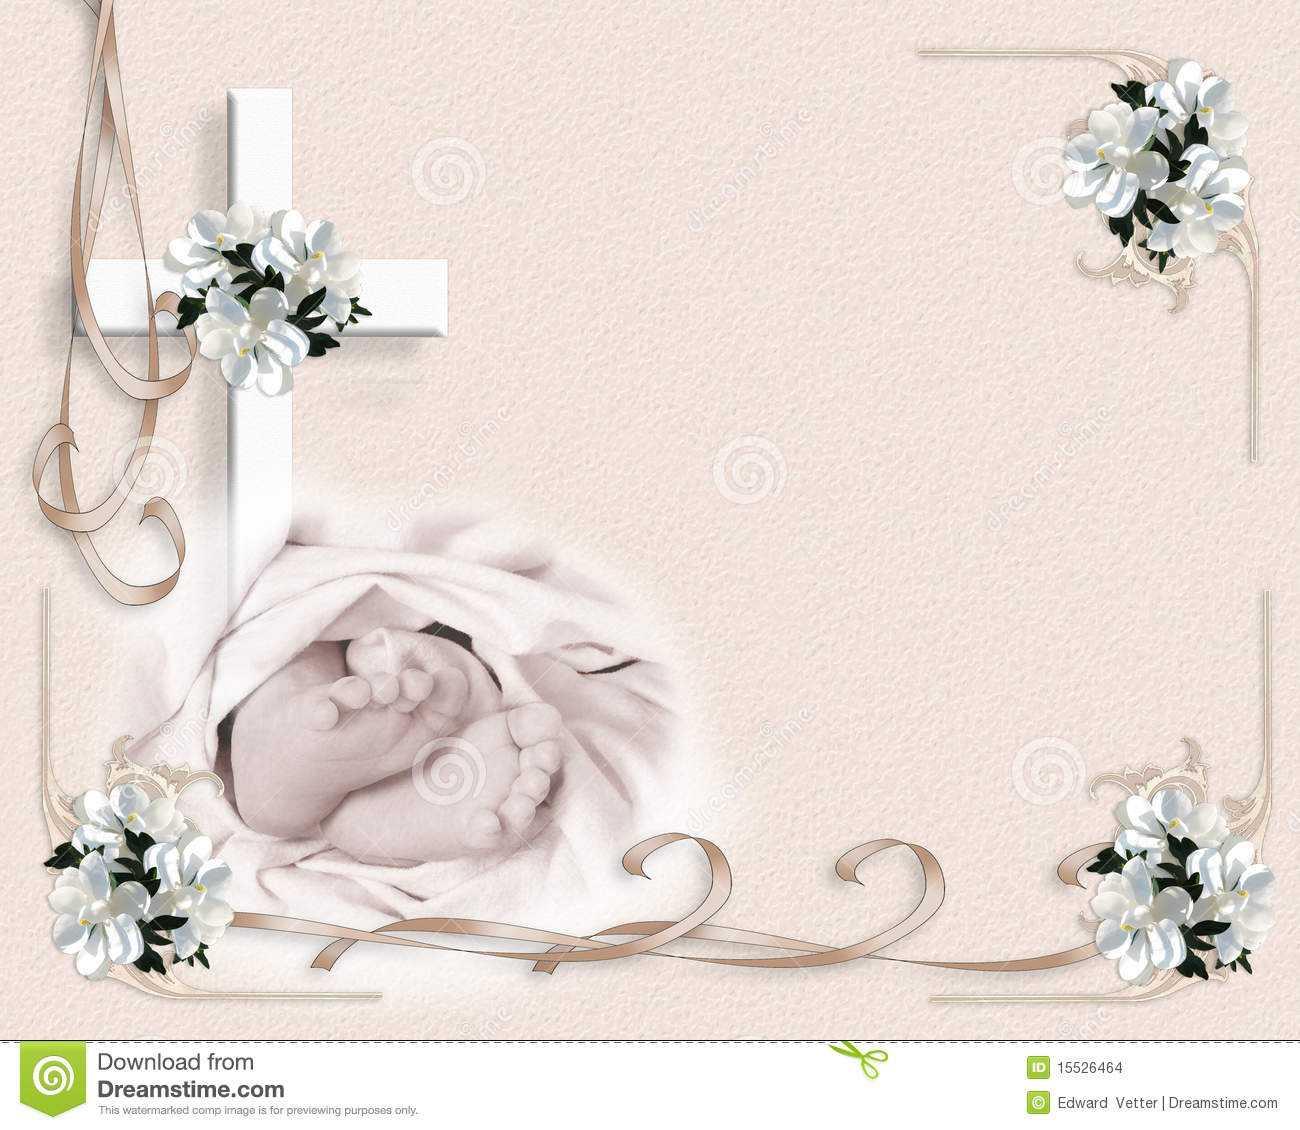 Christening Baptism Invitation Stock Illustration Throughout Free Christening Invitation Cards Templates